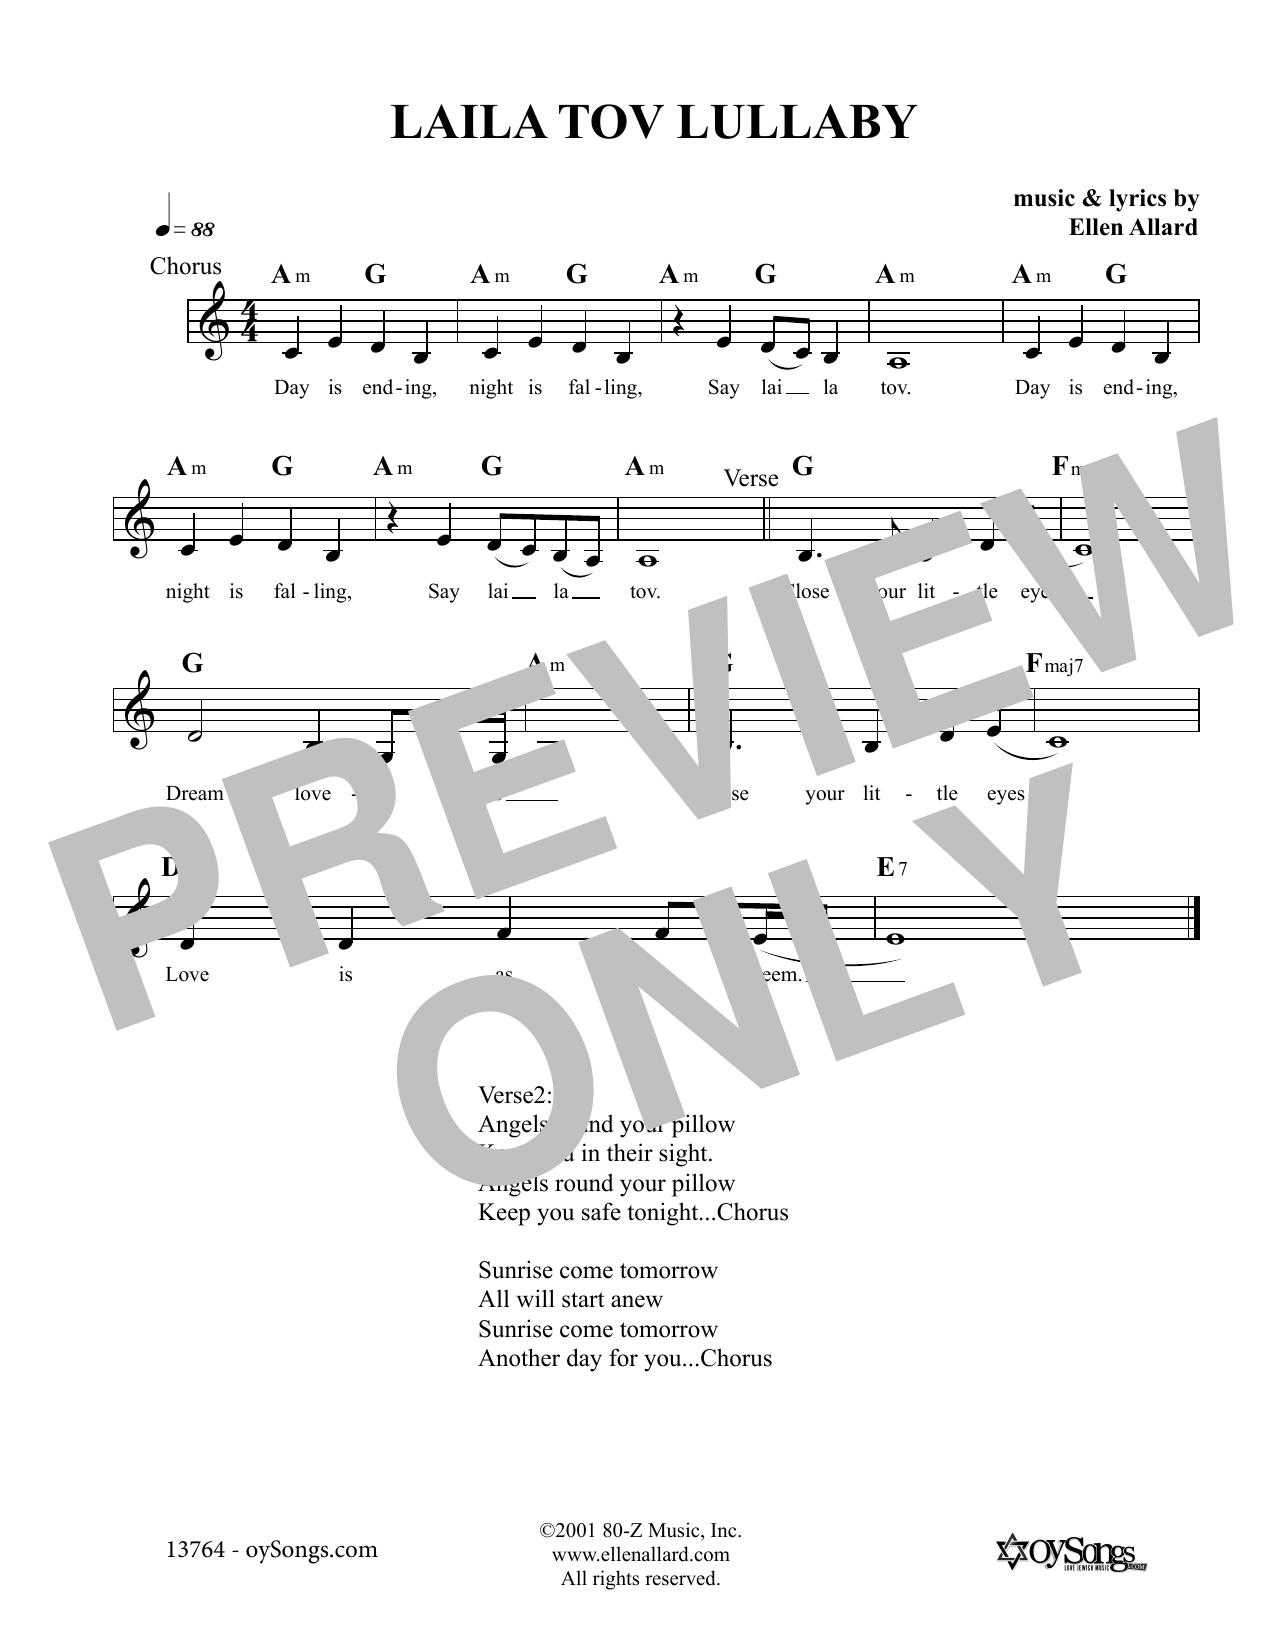 Laila Tov Lullaby Sheet Music